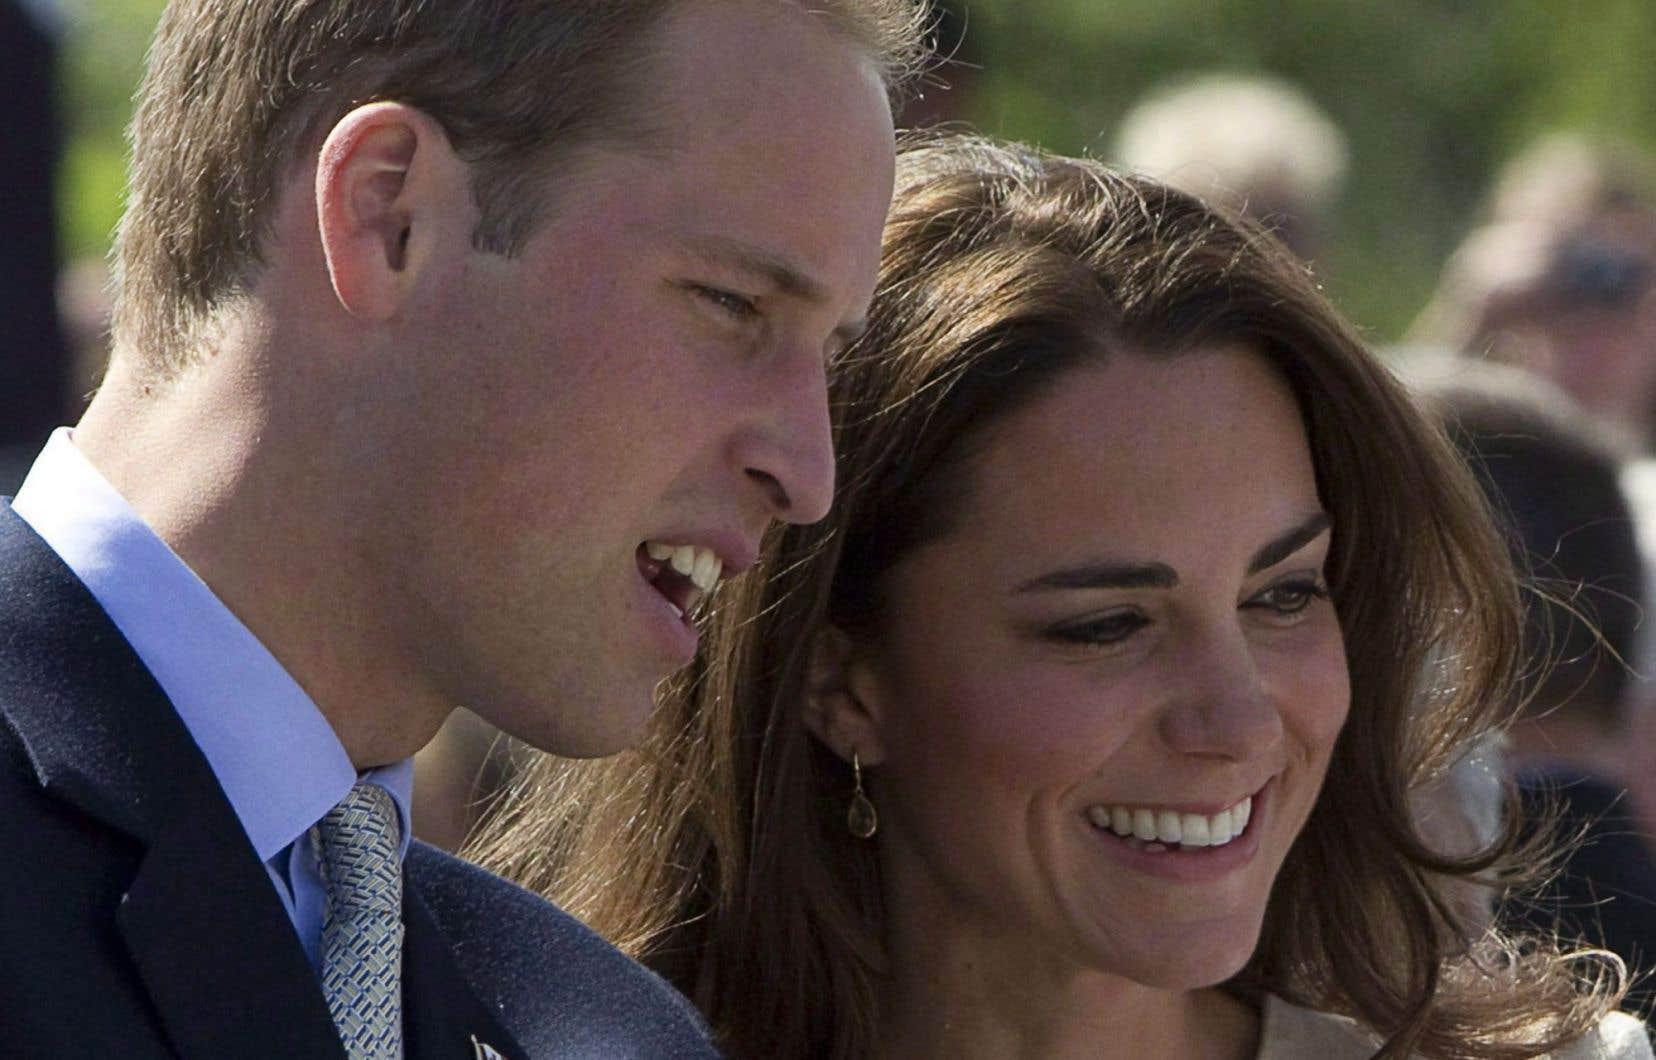 Le prince William et sa femme Kate Middleton